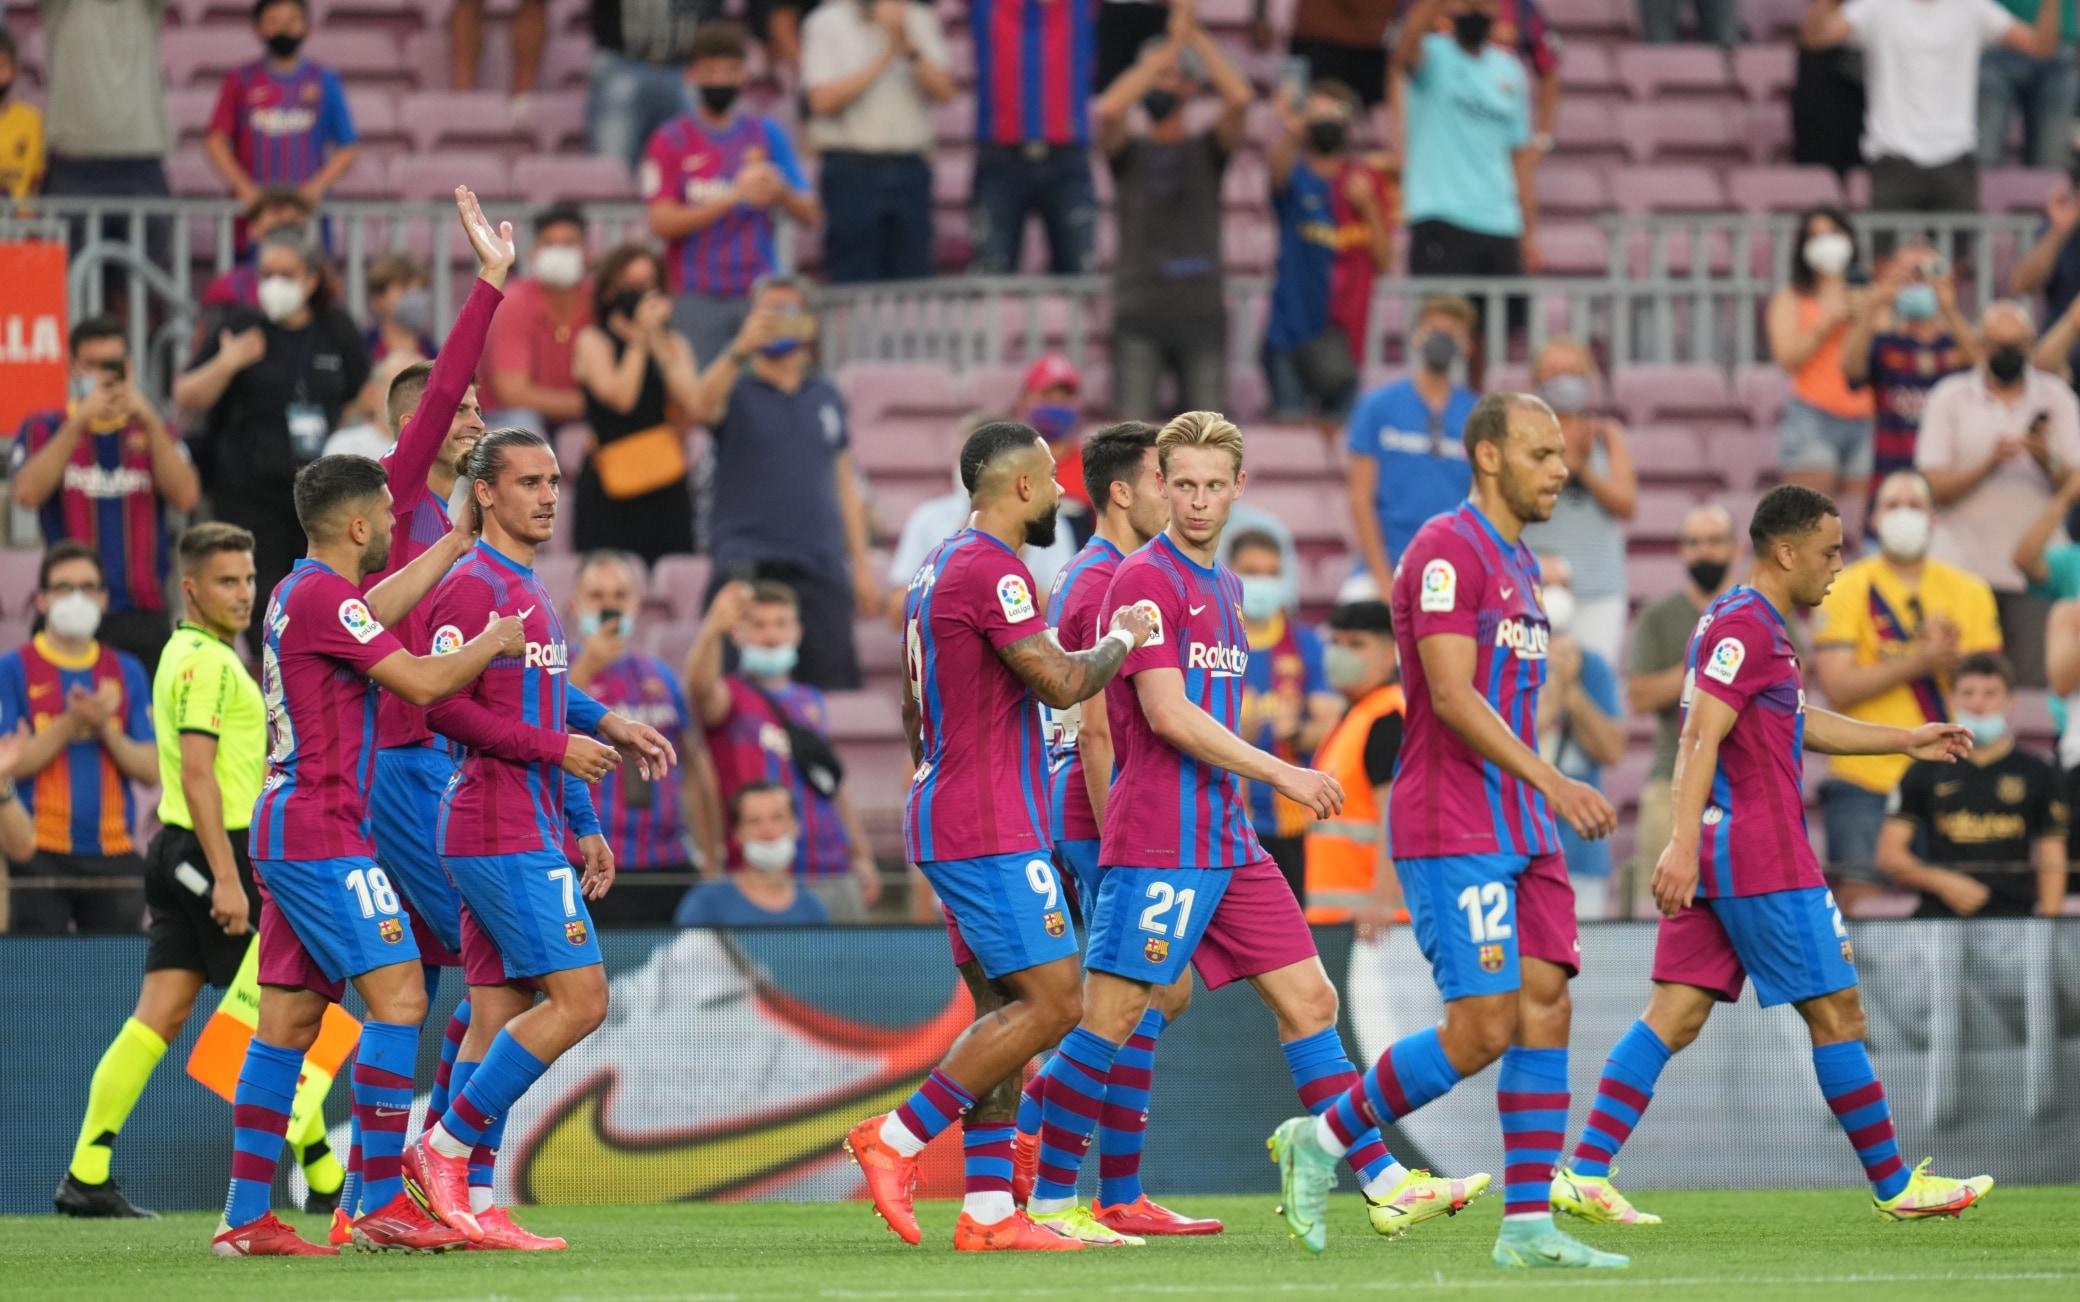 Barcellona Real Sociedad 4-2: prima volta senza Messi, poker blaugrana |  Sky Sport